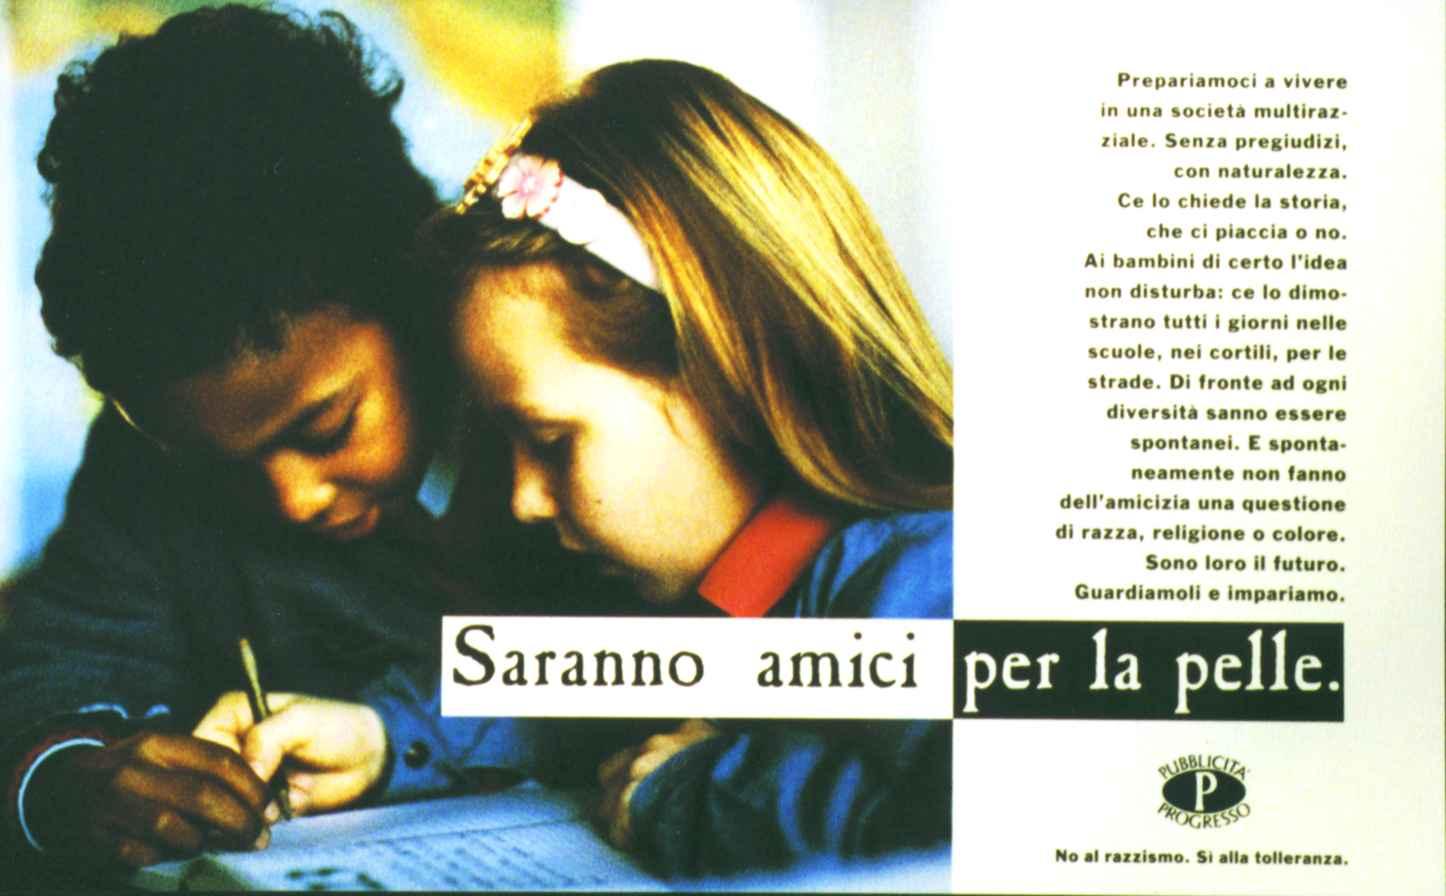 http://4.bp.blogspot.com/-1OKLi_QVUCc/TqbnGeiHG2I/AAAAAAAAKqA/aRkwqMydDrA/s1600/pp-scolari.jpg